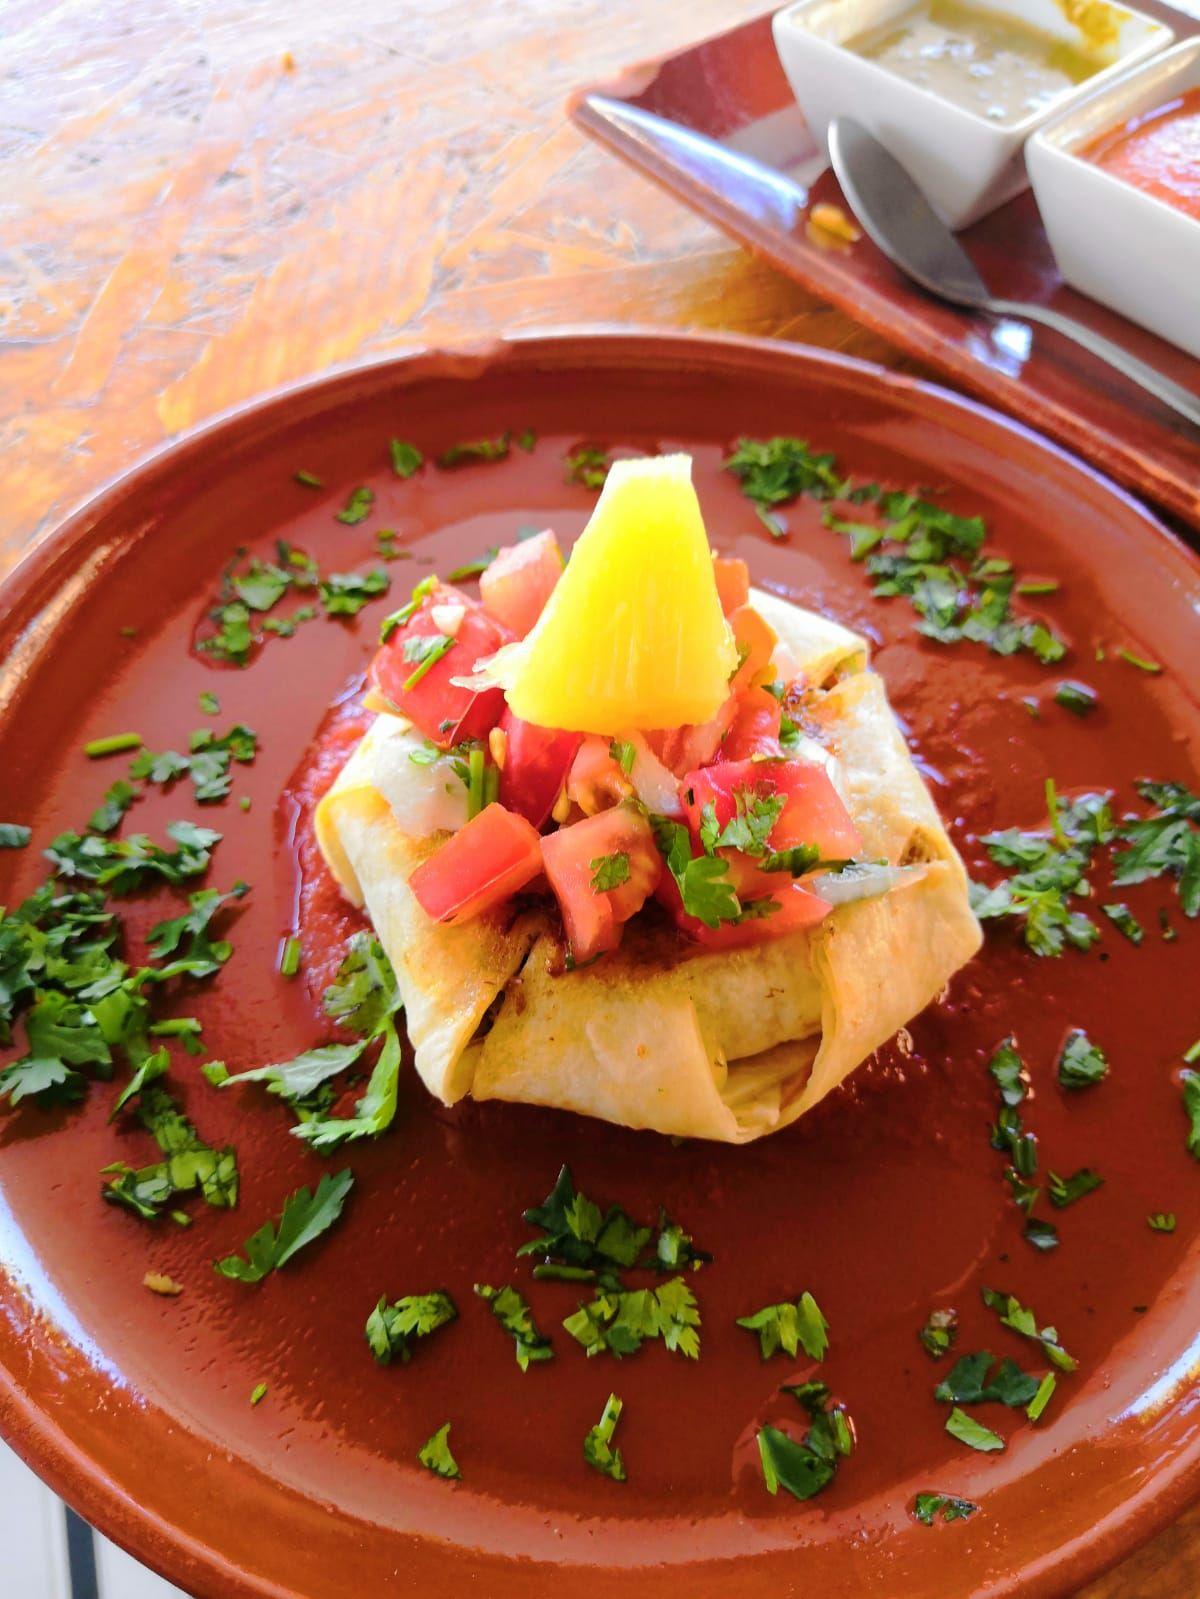 Foto 22 de Restaurante mexicano en  | Cantina La Catrina